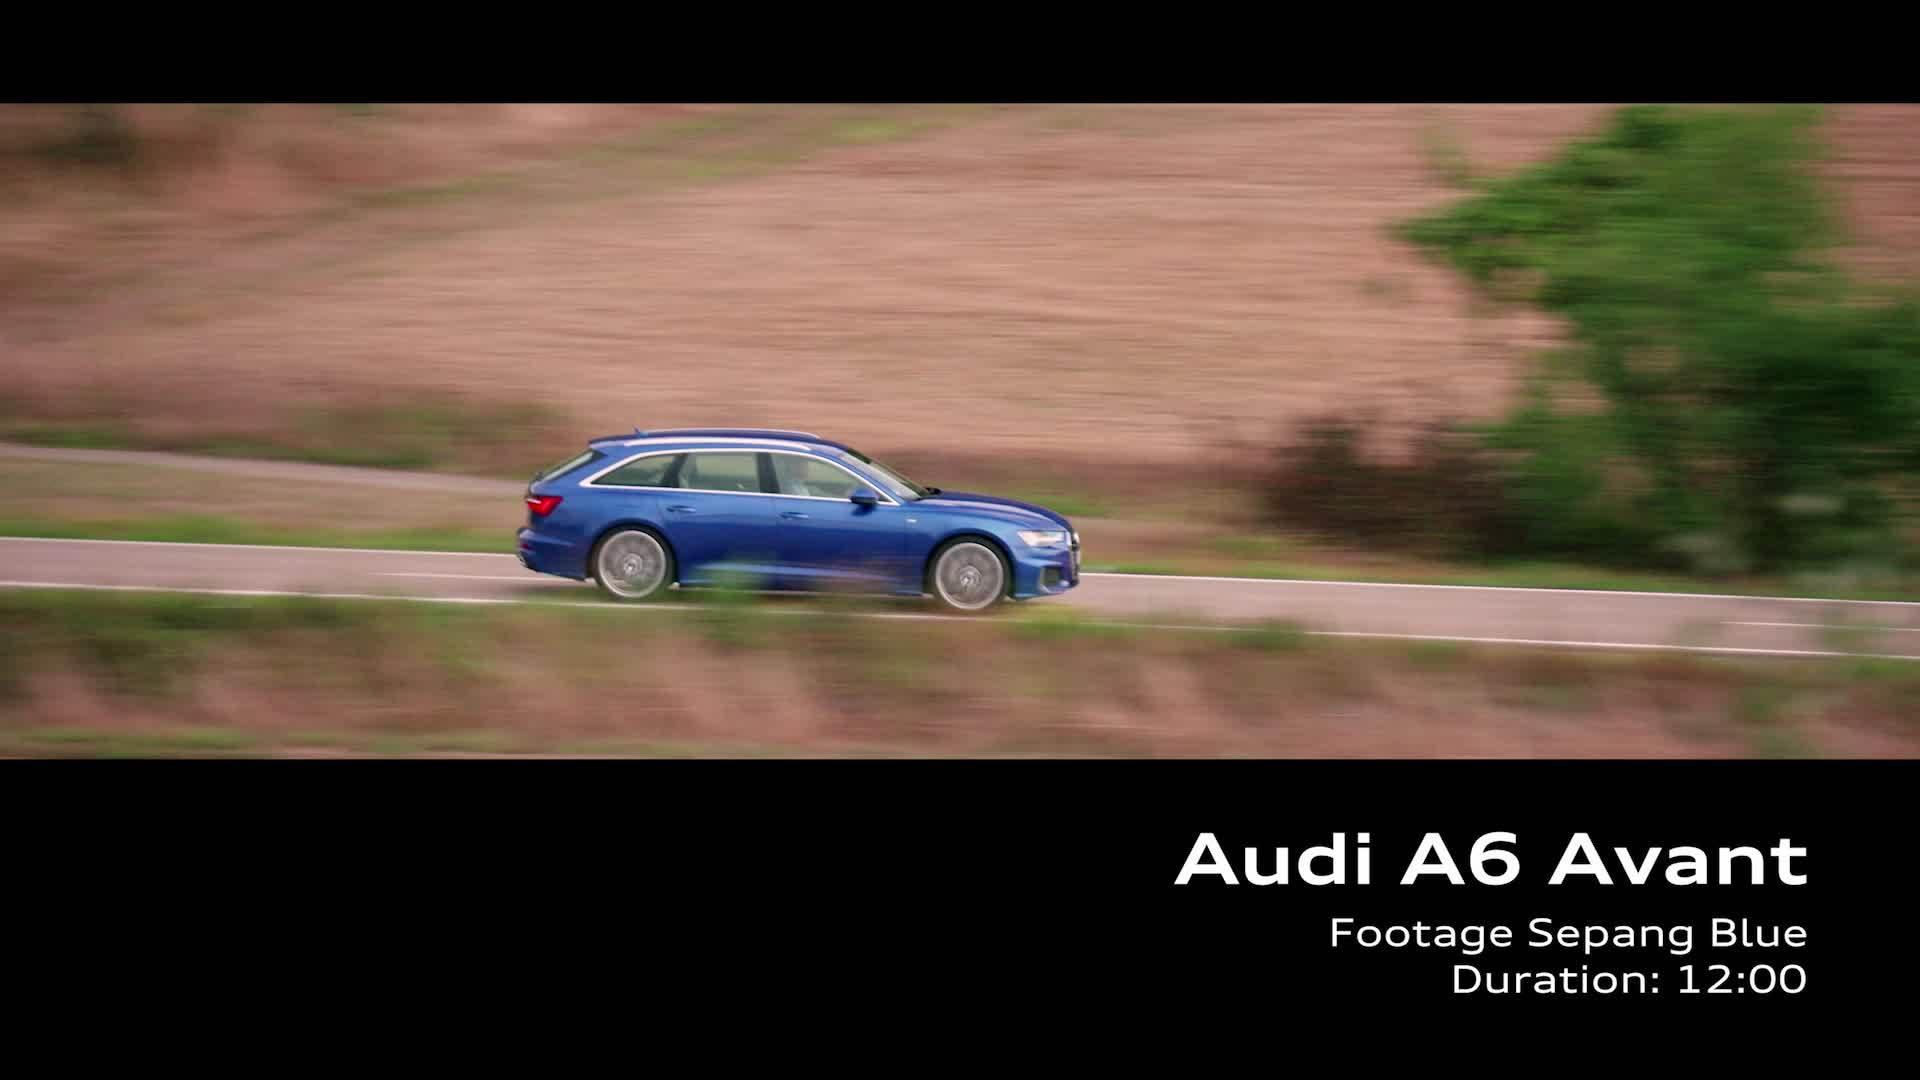 Audi A6 Avant – on Location Footage Sepang Blue